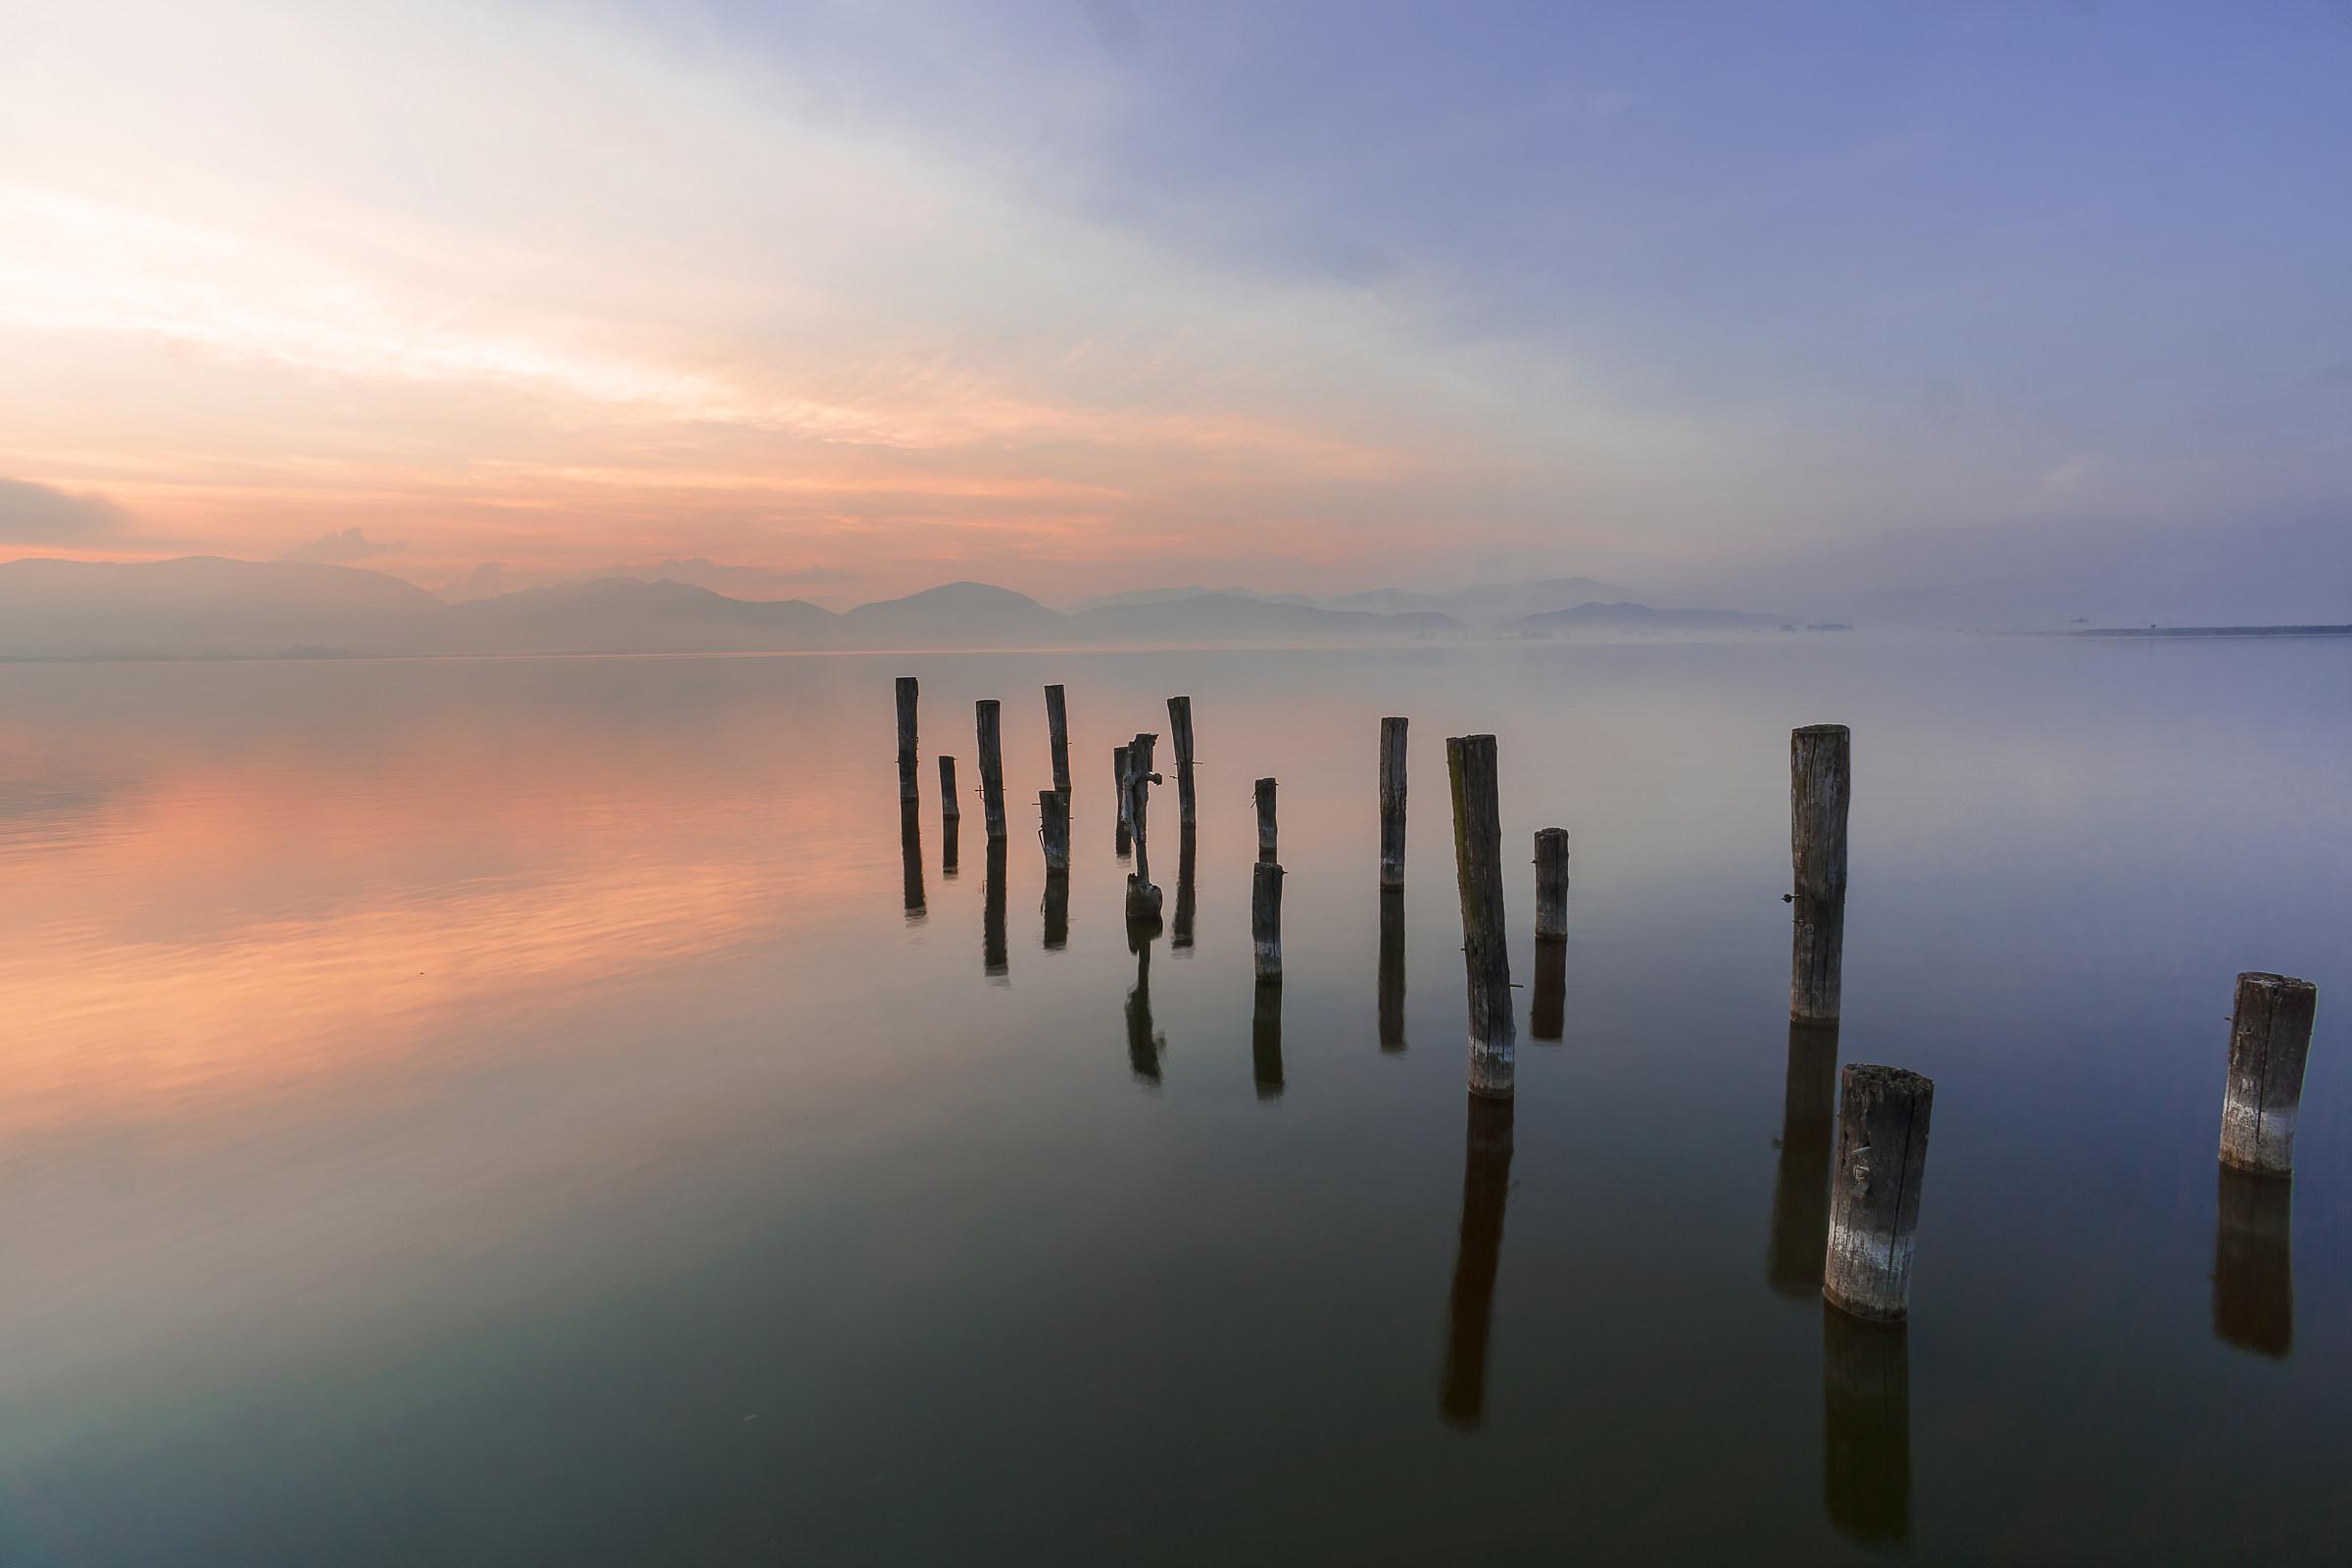 Sunrise at Massaciuccoli 3...